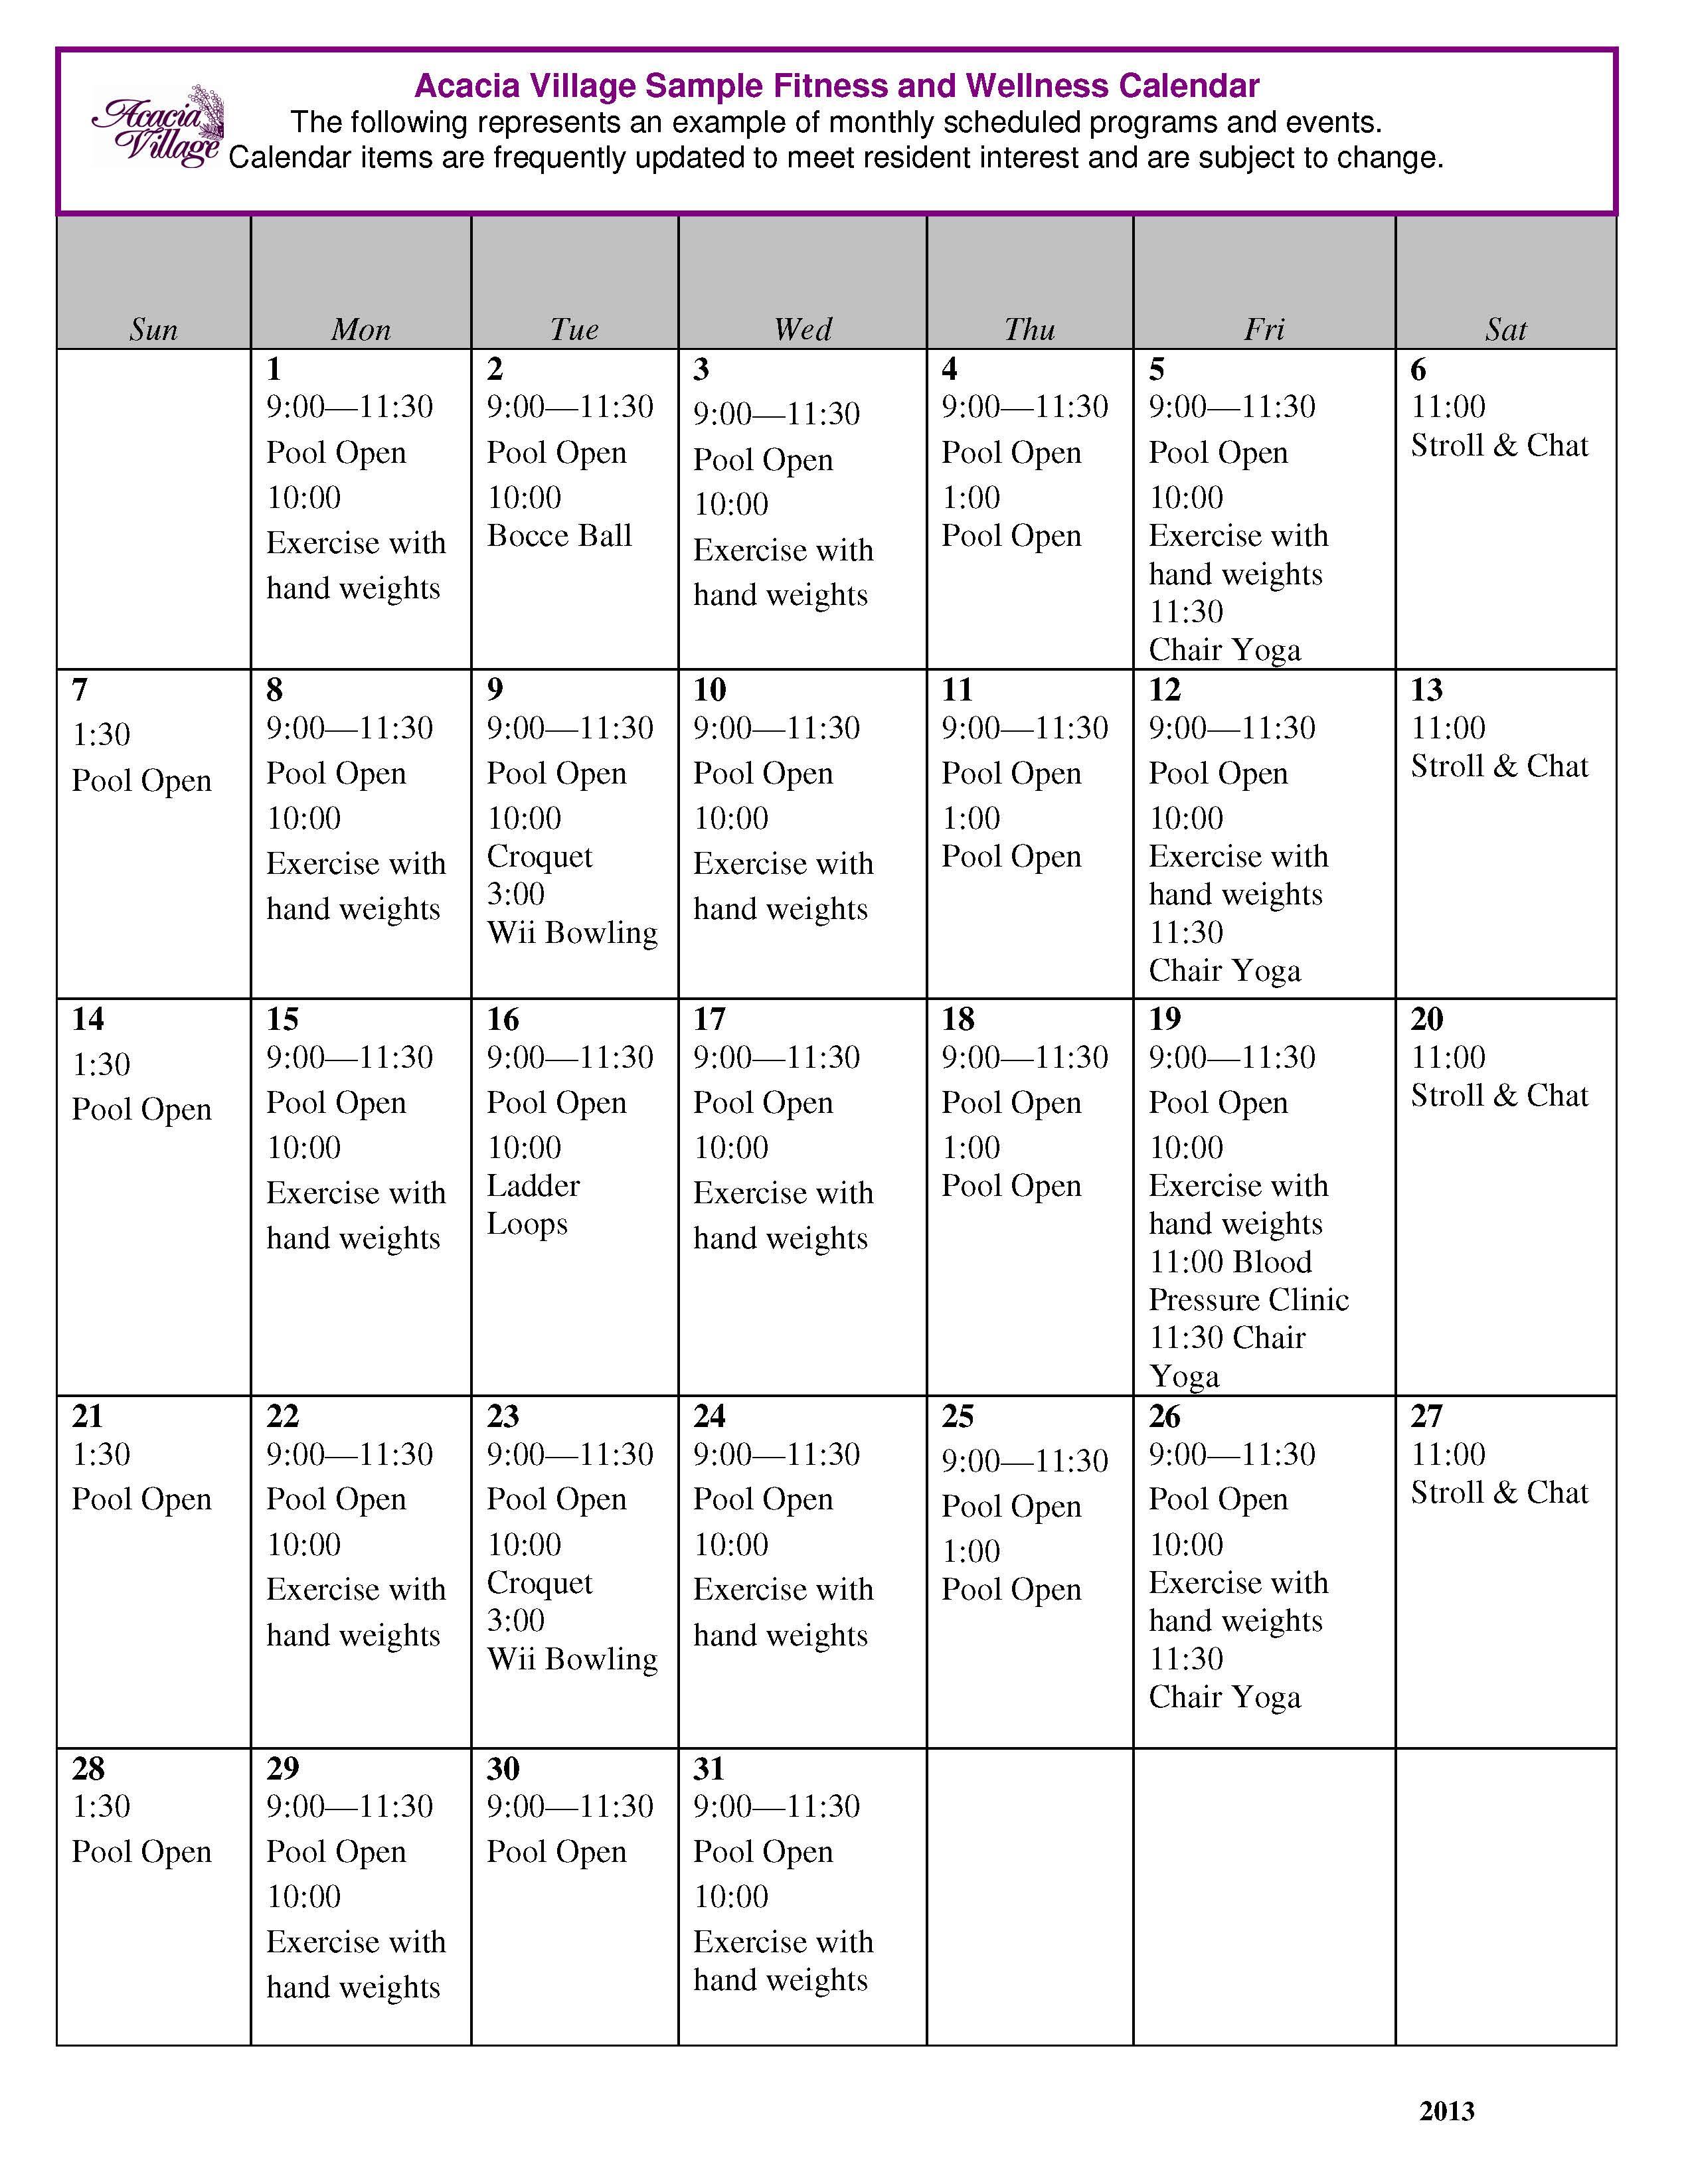 Acacia fitness calendar example